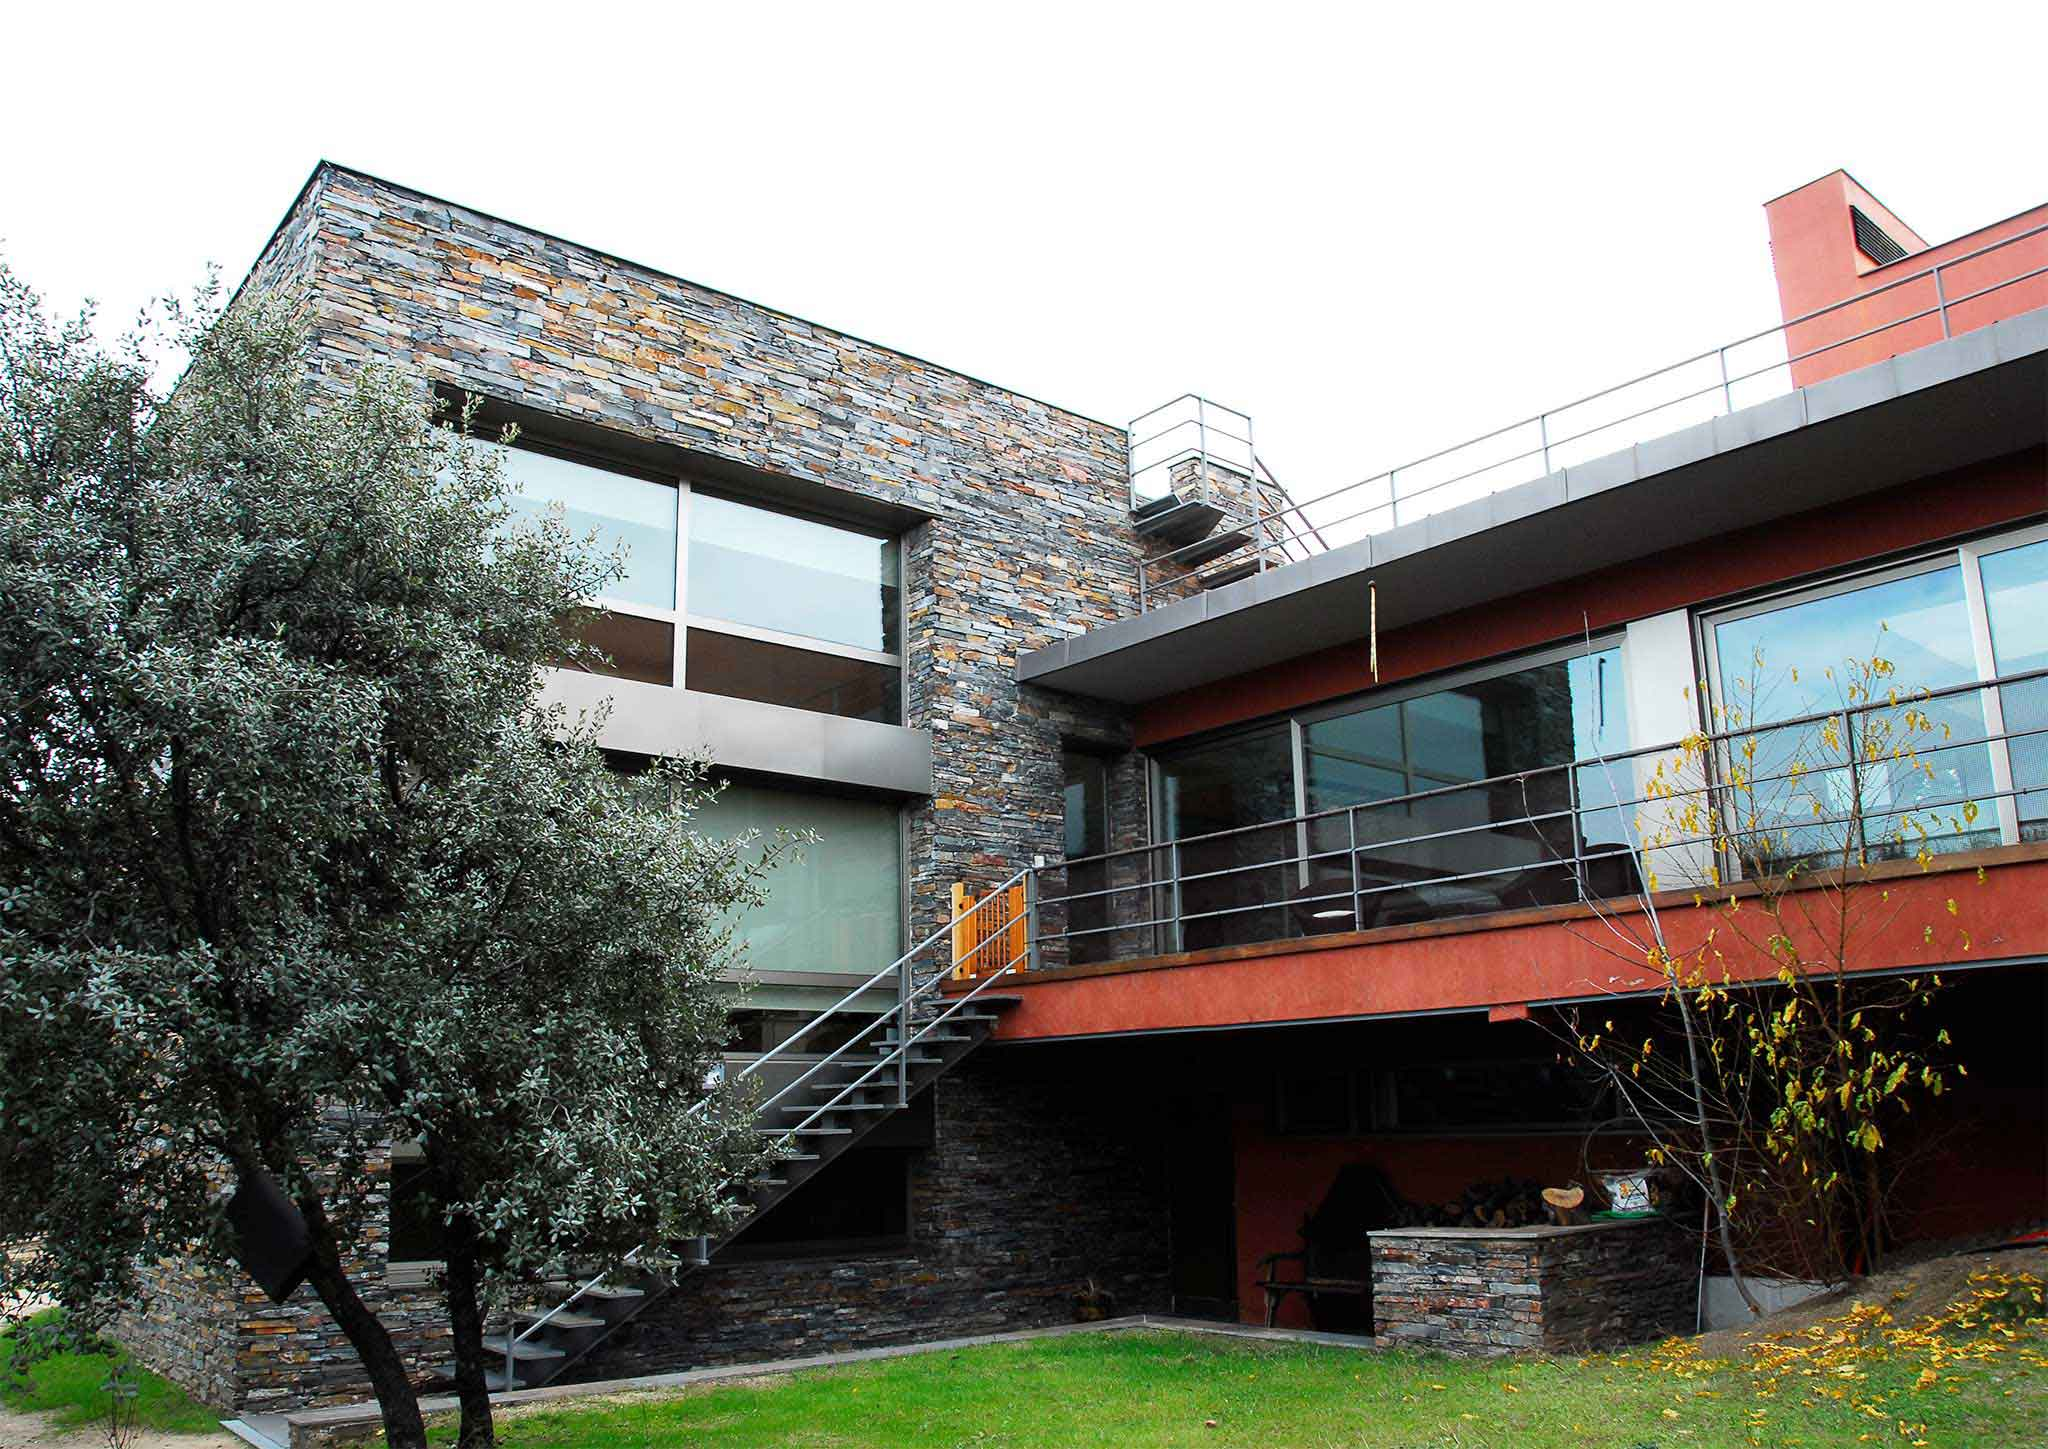 Casa en villanueva de la ca ada madrid otero arquitectos - Casa villanueva de la canada ...